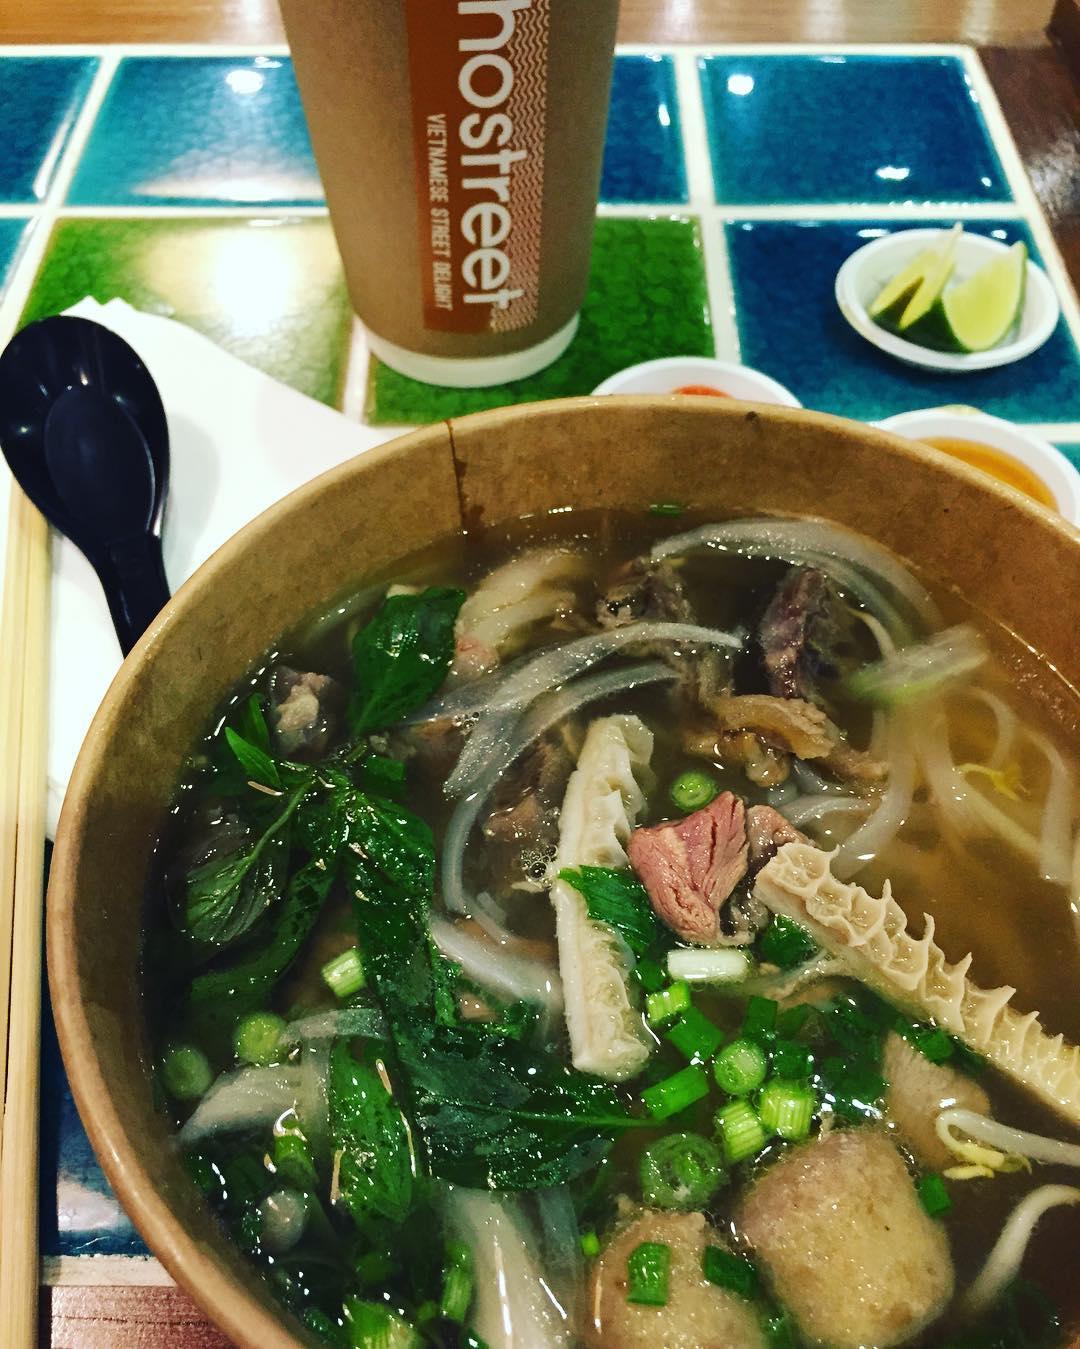 affordable vietnamese food - pho street